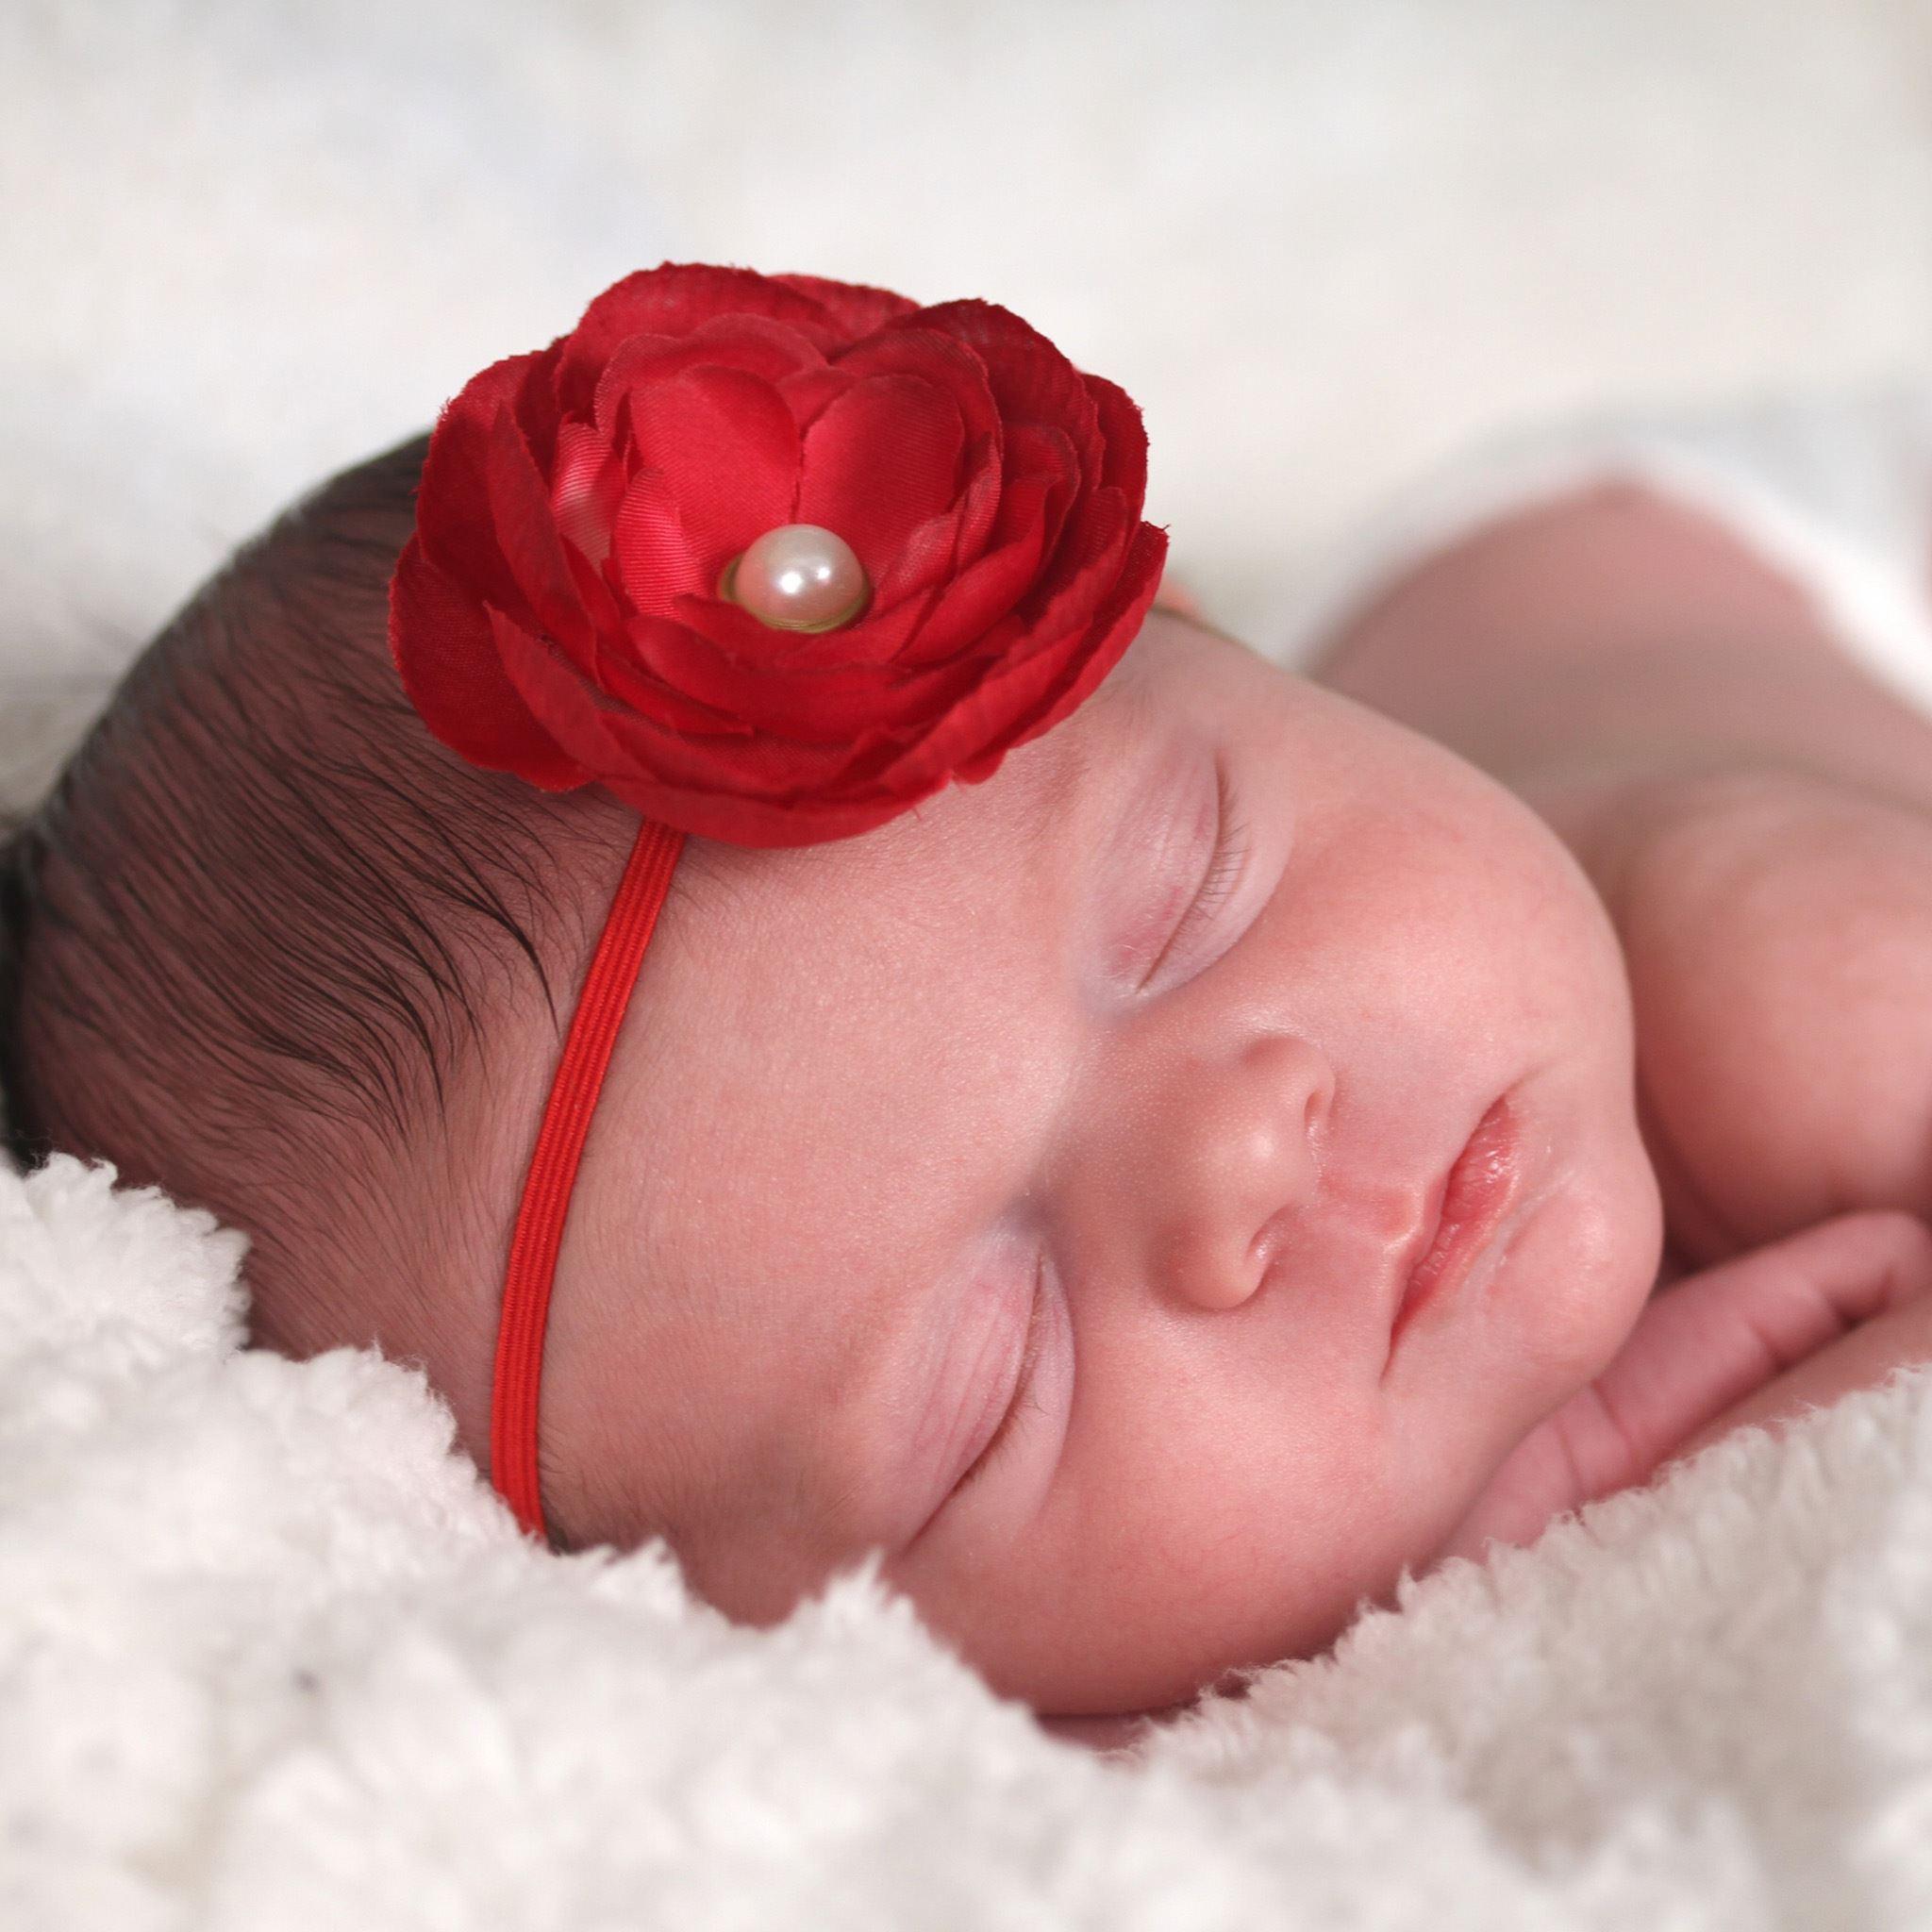 Newborn Baby Sleeping Ipad Wallpapers Free Download